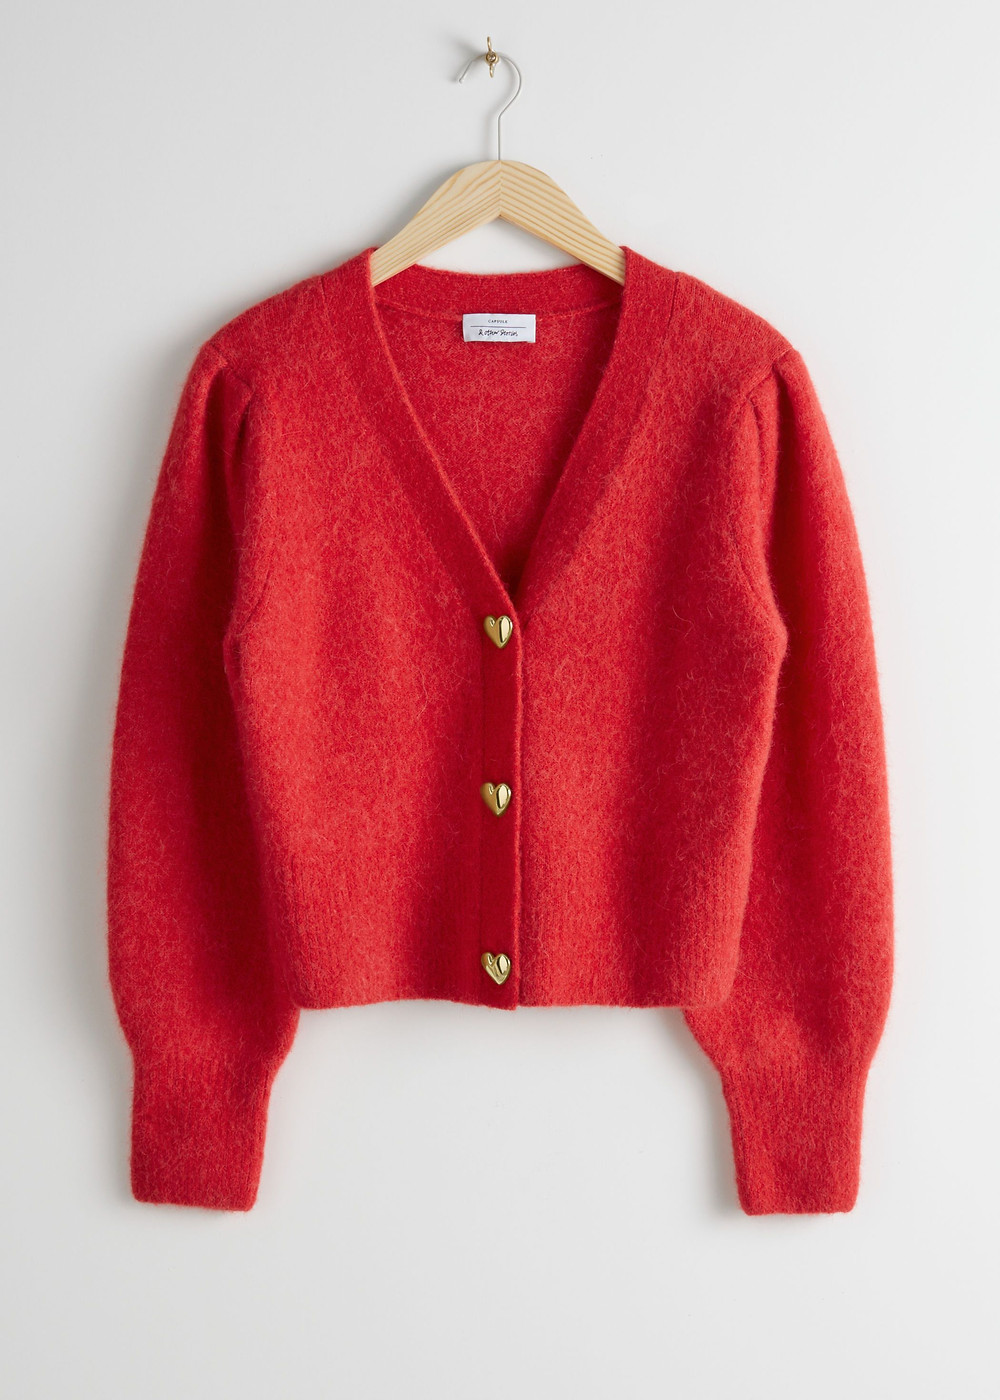 Cardigan trend, My Savvy Fashion Picks For Autumn/Winter 2020,The Image Tree Blog